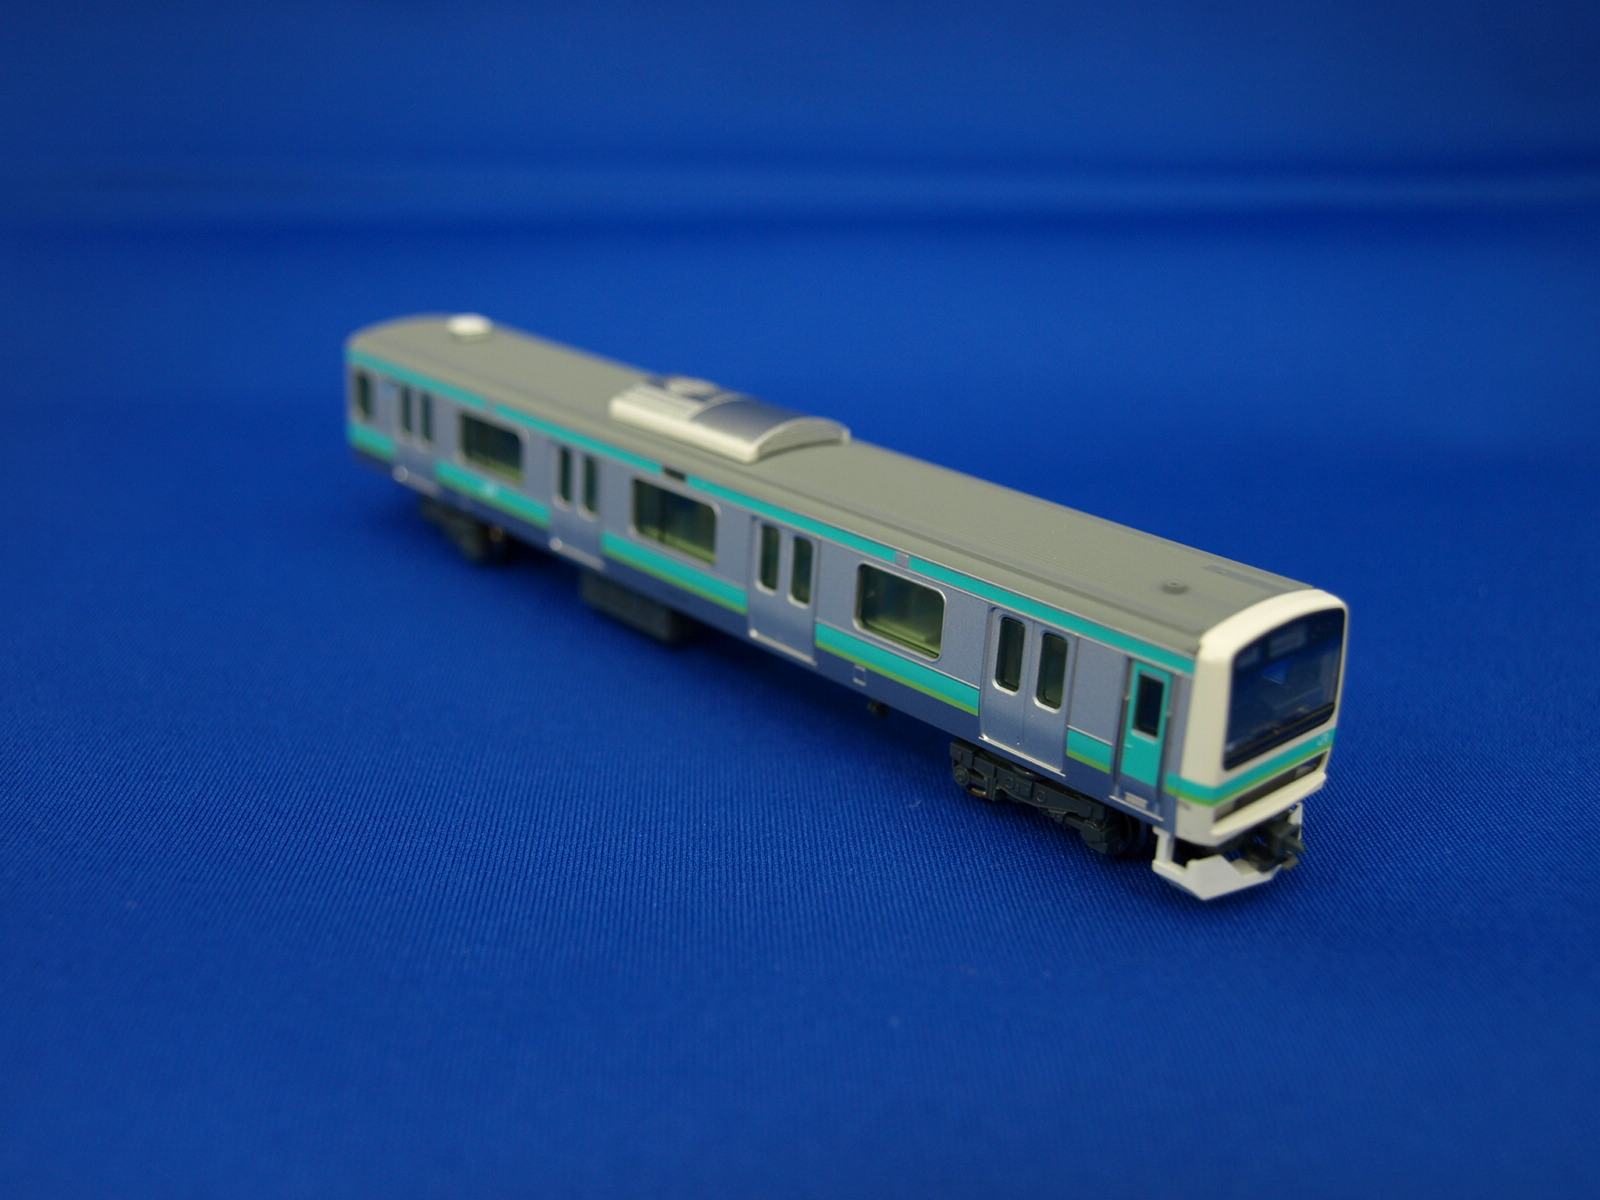 Nゲージ カトー  10-1339  E231系 常磐線・上野東京ライン 5両セット